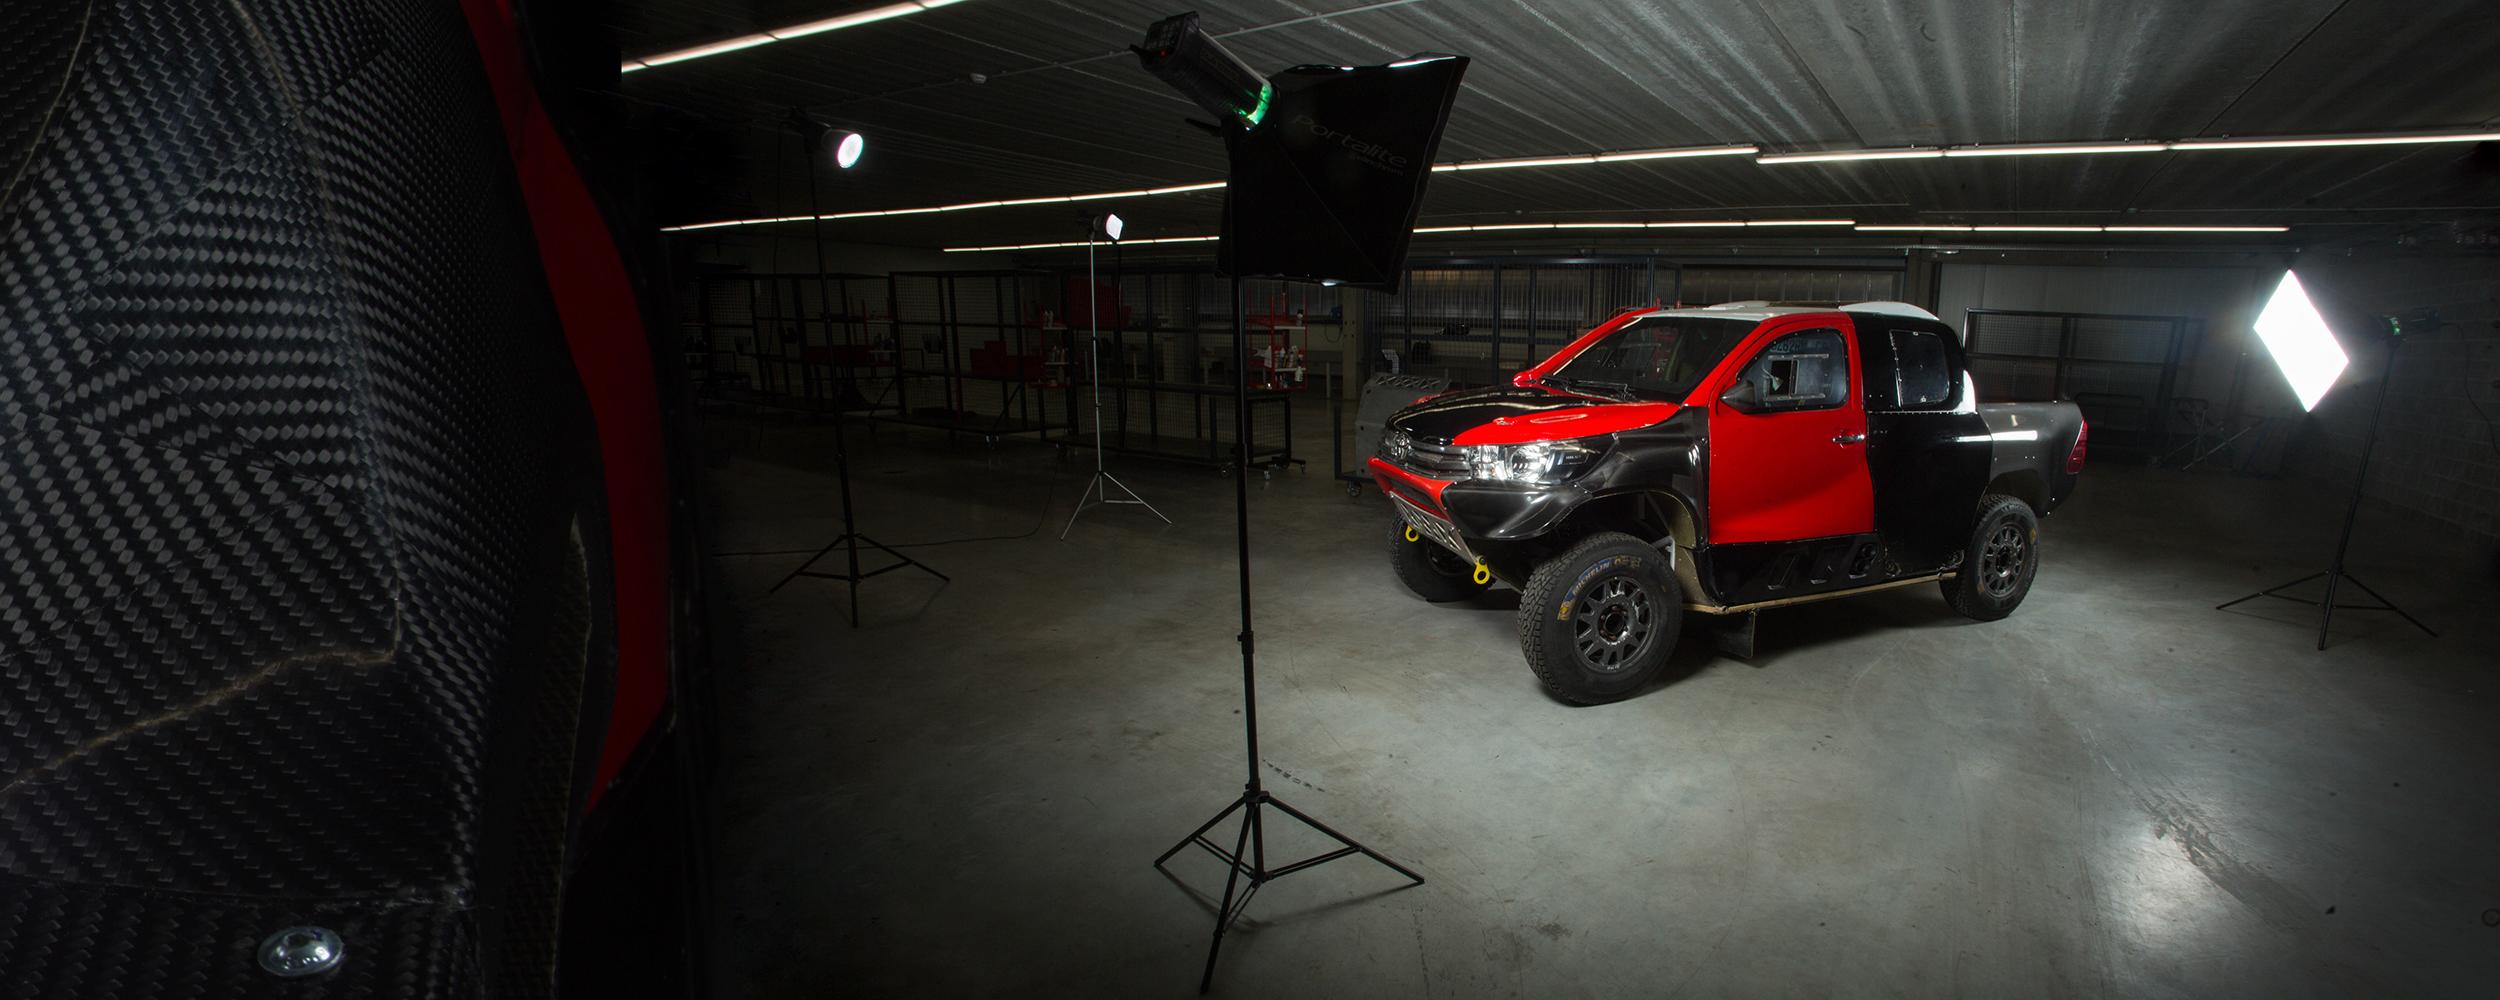 Le Dakar d'Overdrive